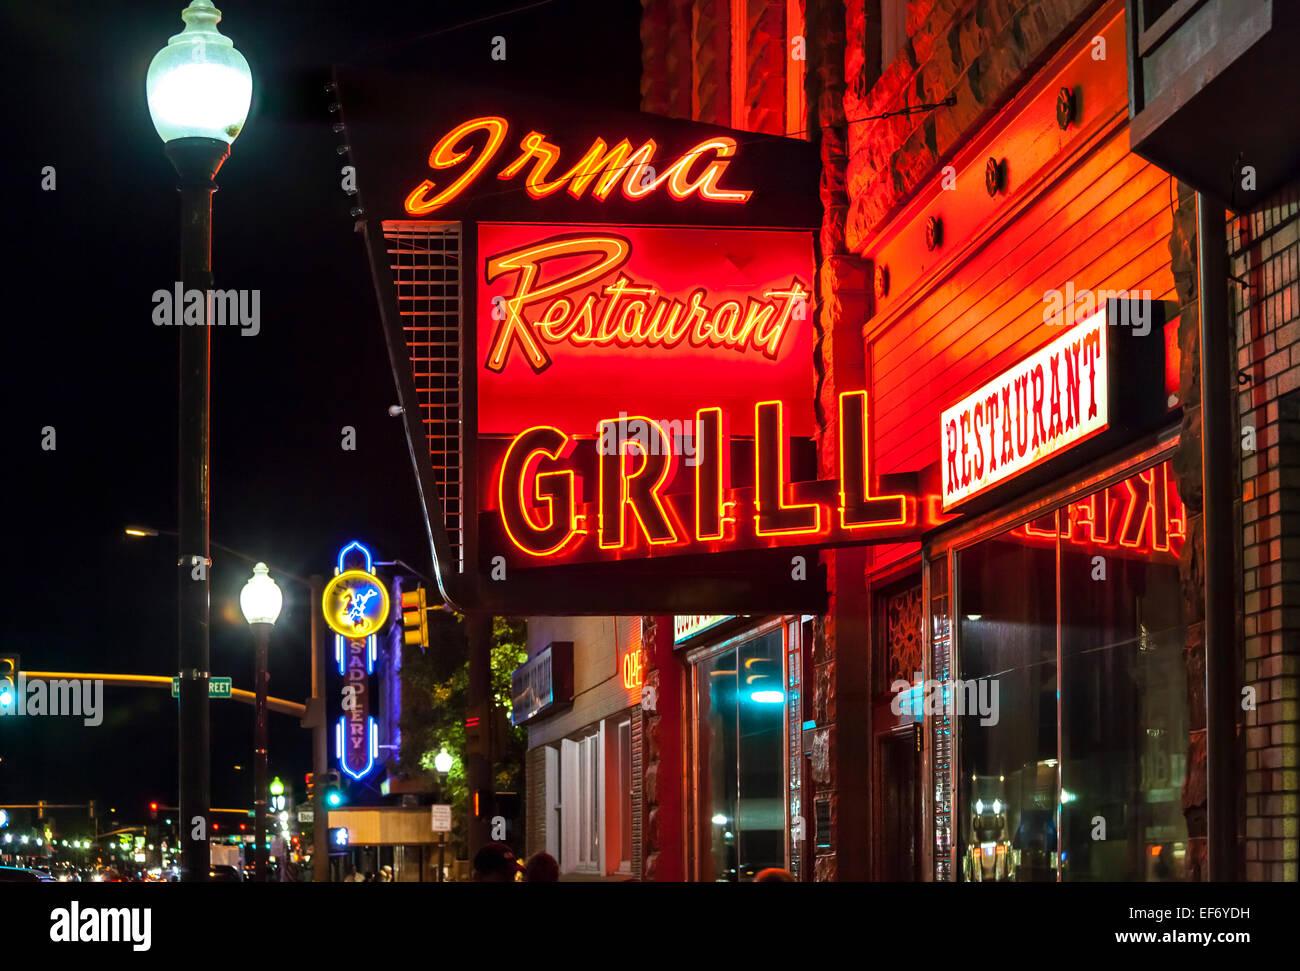 Irma Hotel Restaurant Grill in Cody, Wyoming. Vintage Leuchtreklame. Stockbild